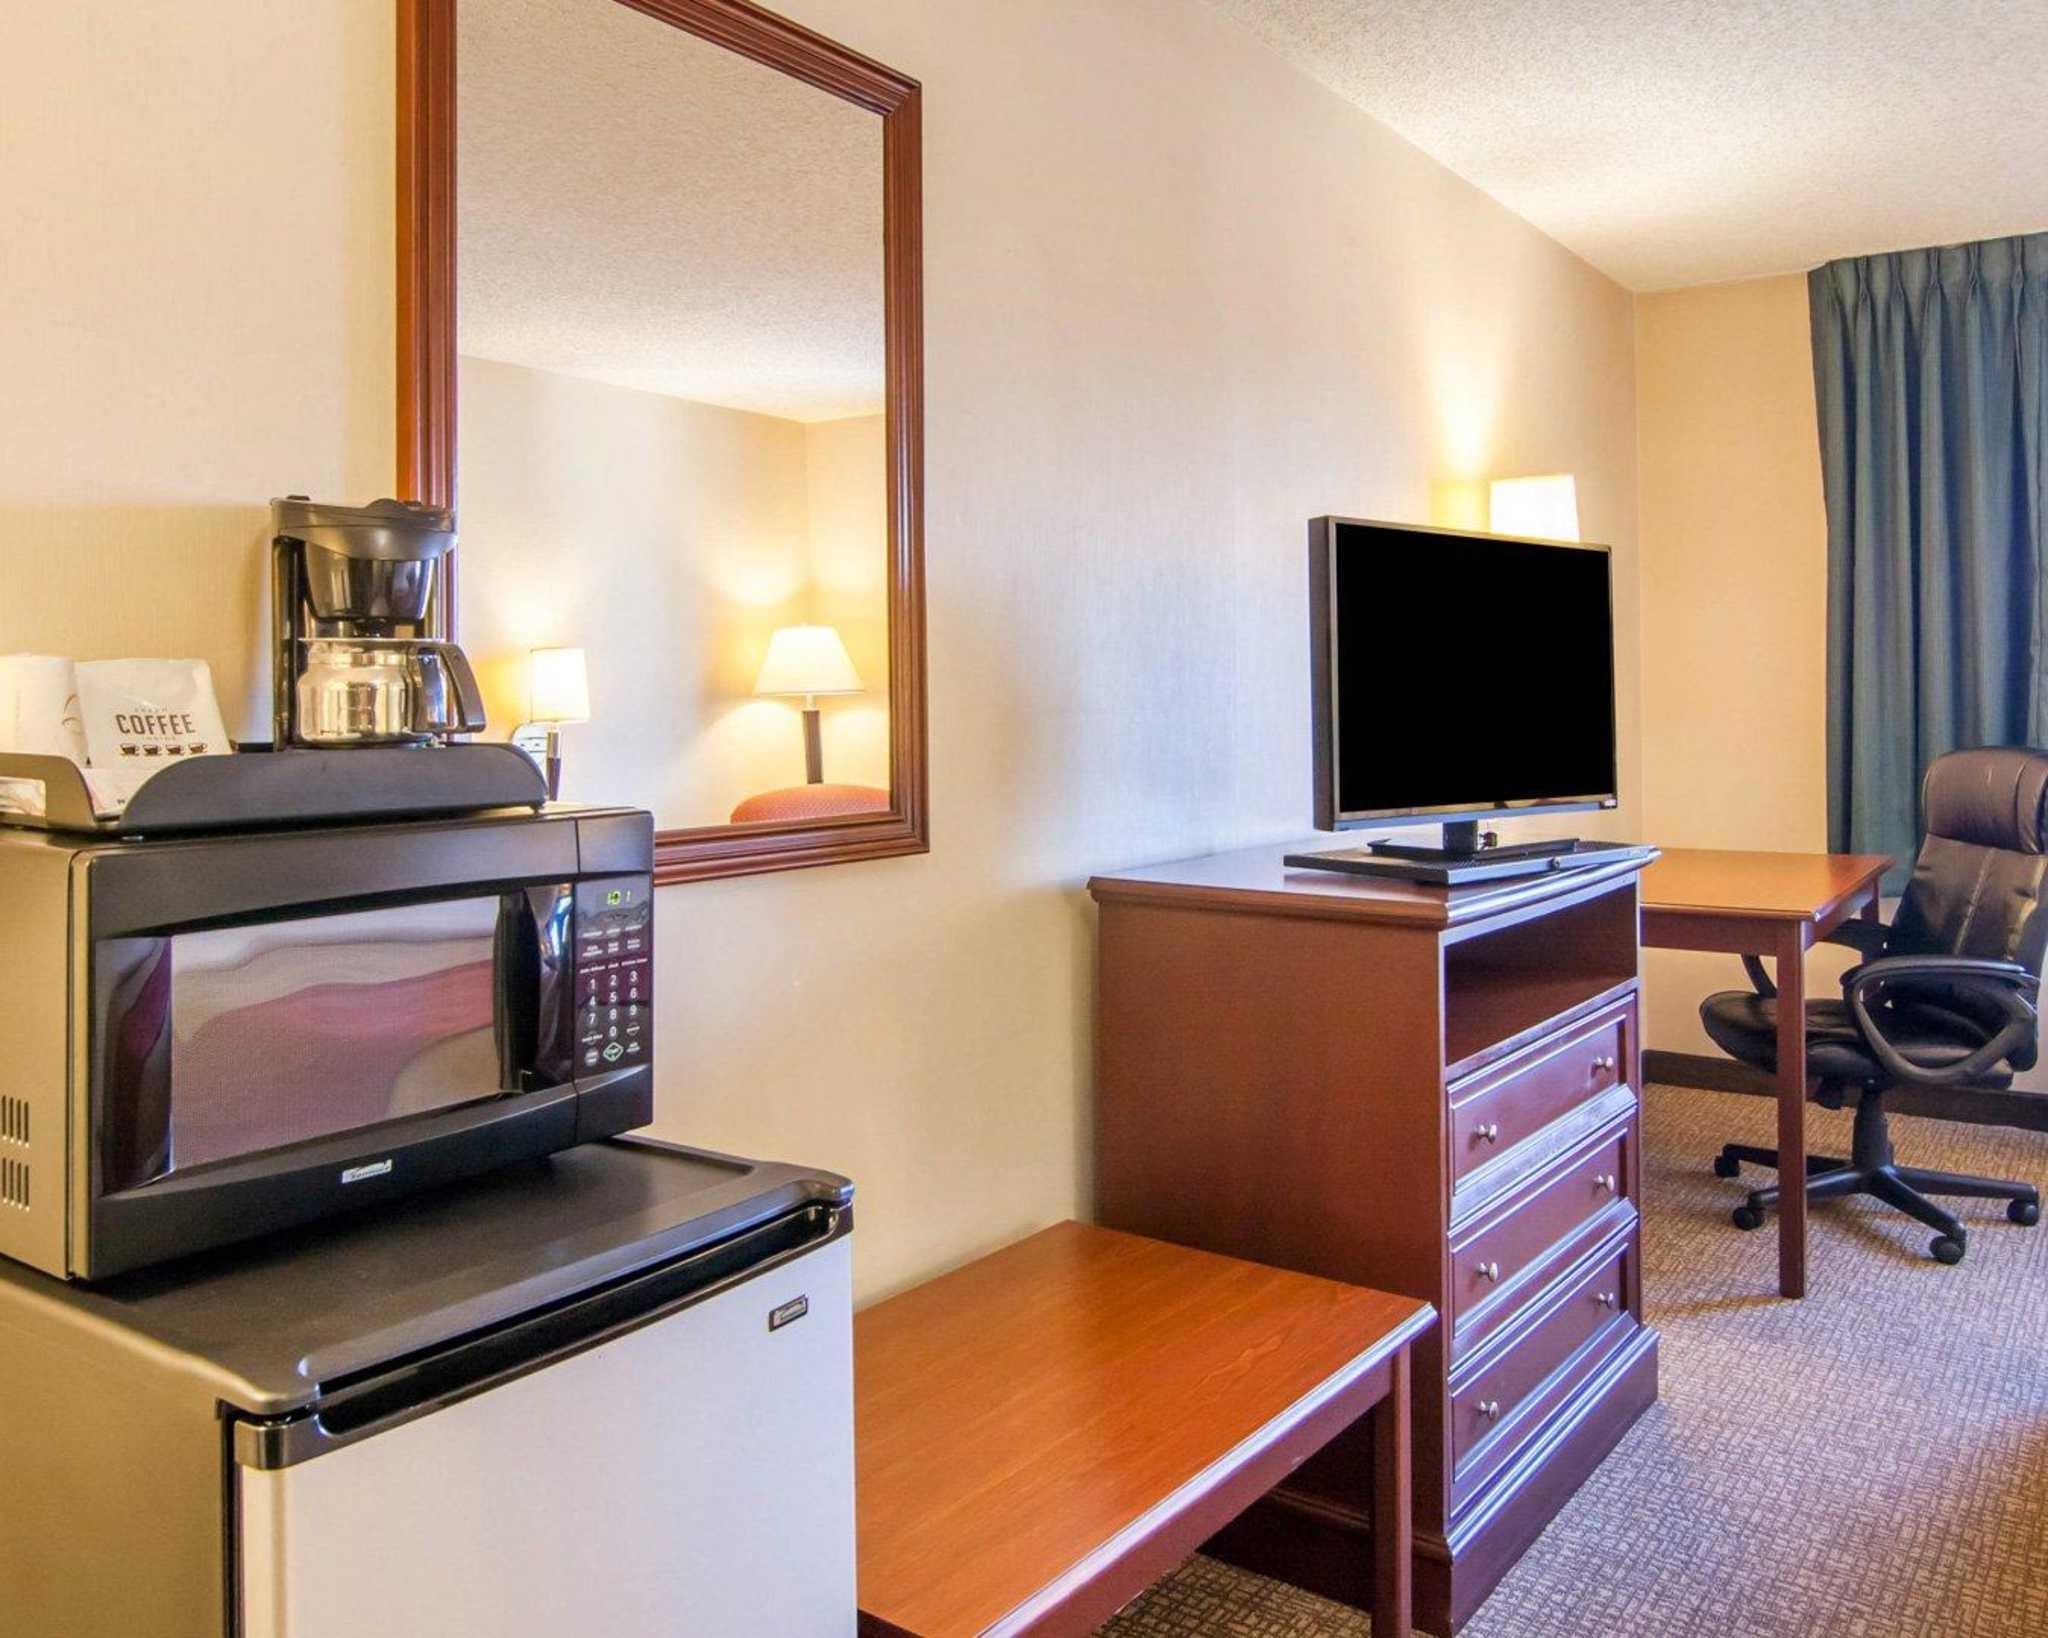 Comfort Inn North image 7